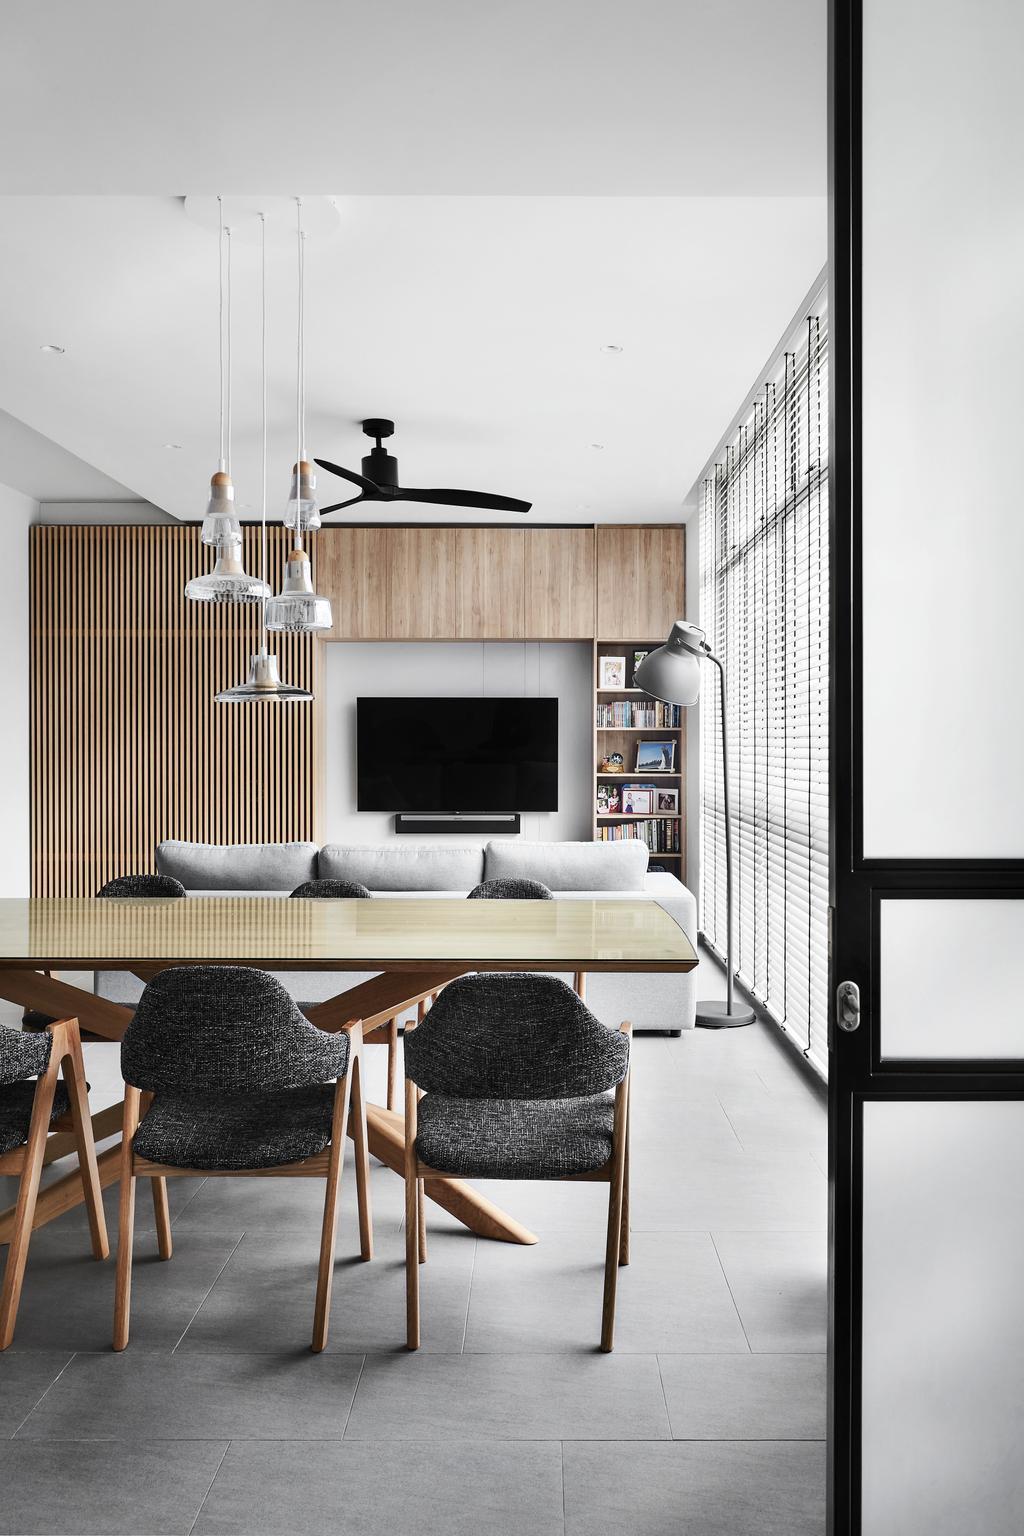 The Shelford by Third Avenue Studio